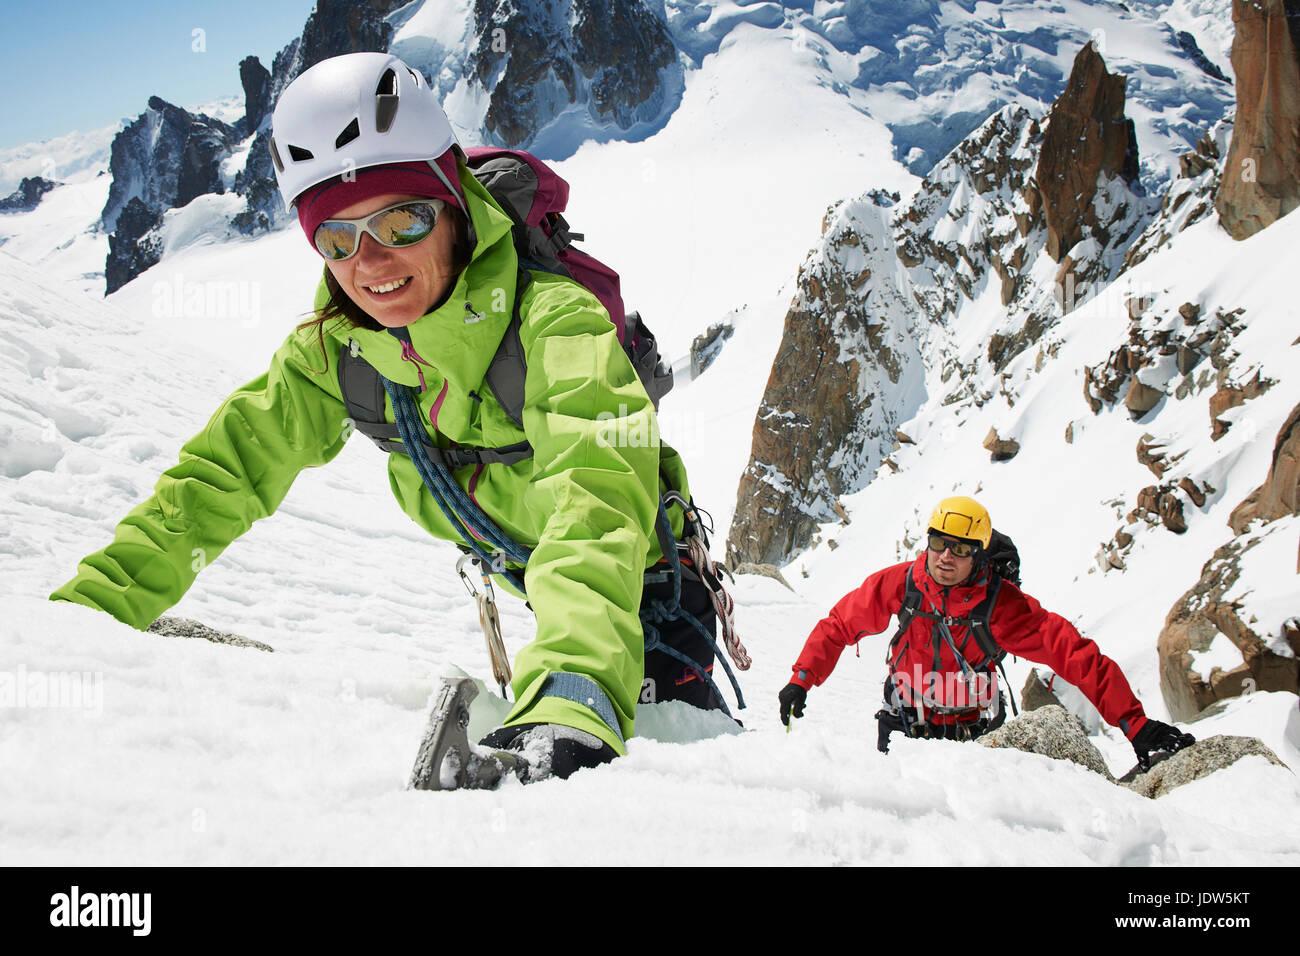 Zwei Personen Bergsteigen, Chamonix, Frankreich Stockbild